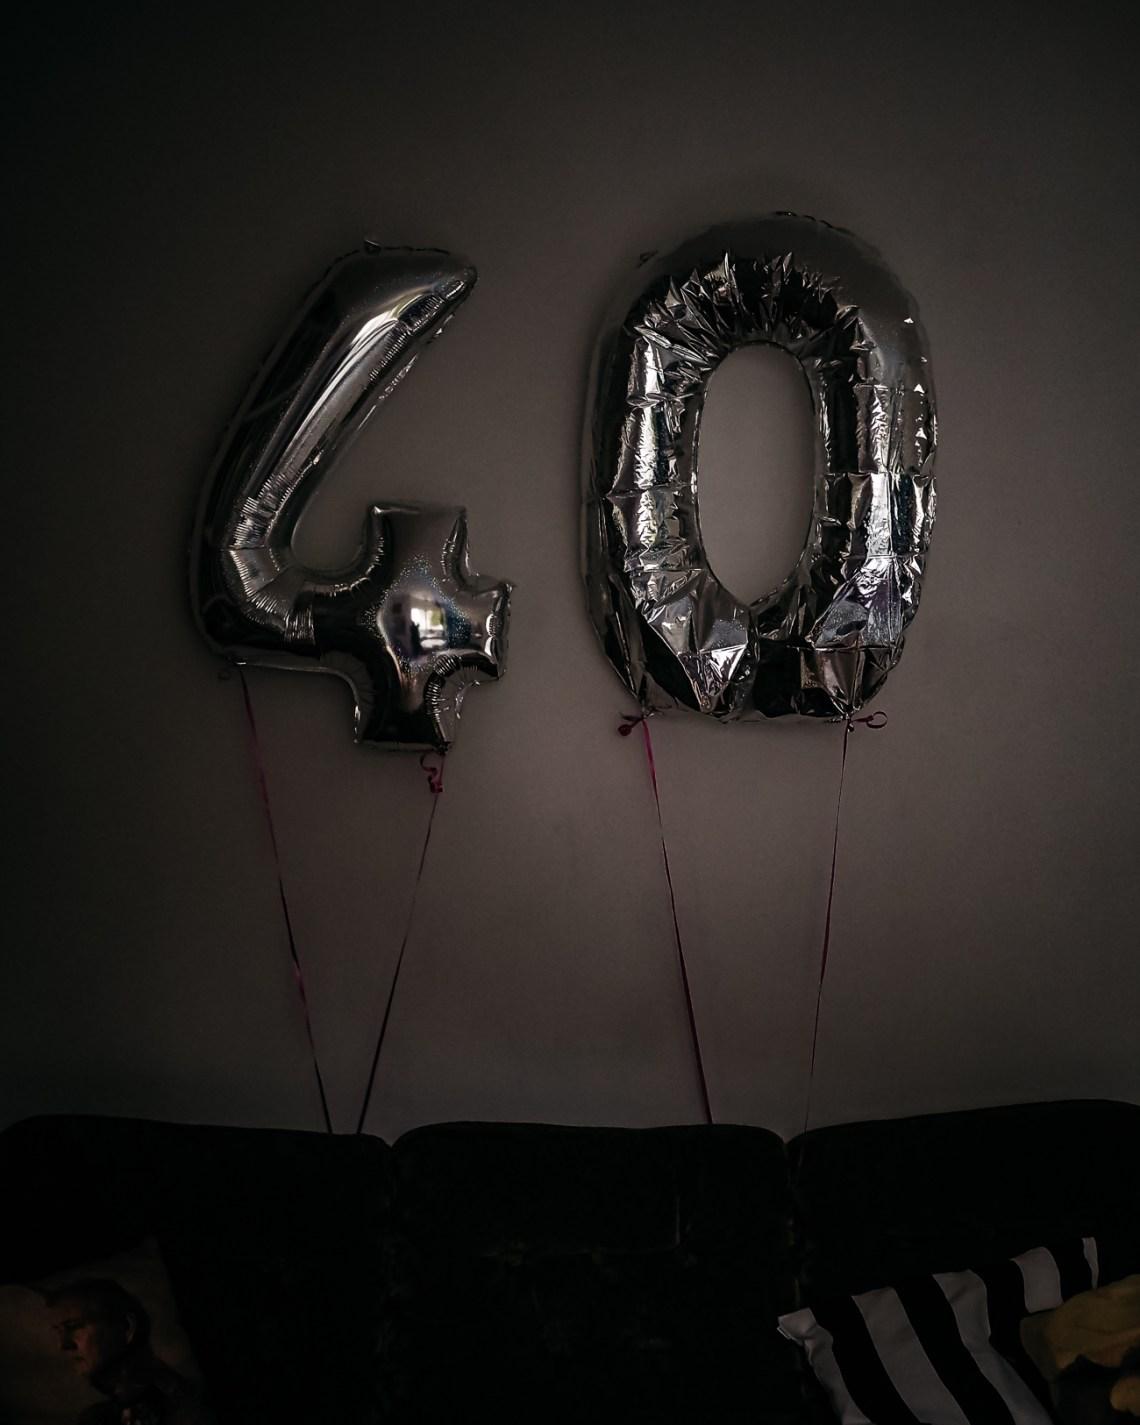 40 vuotisjuhlat